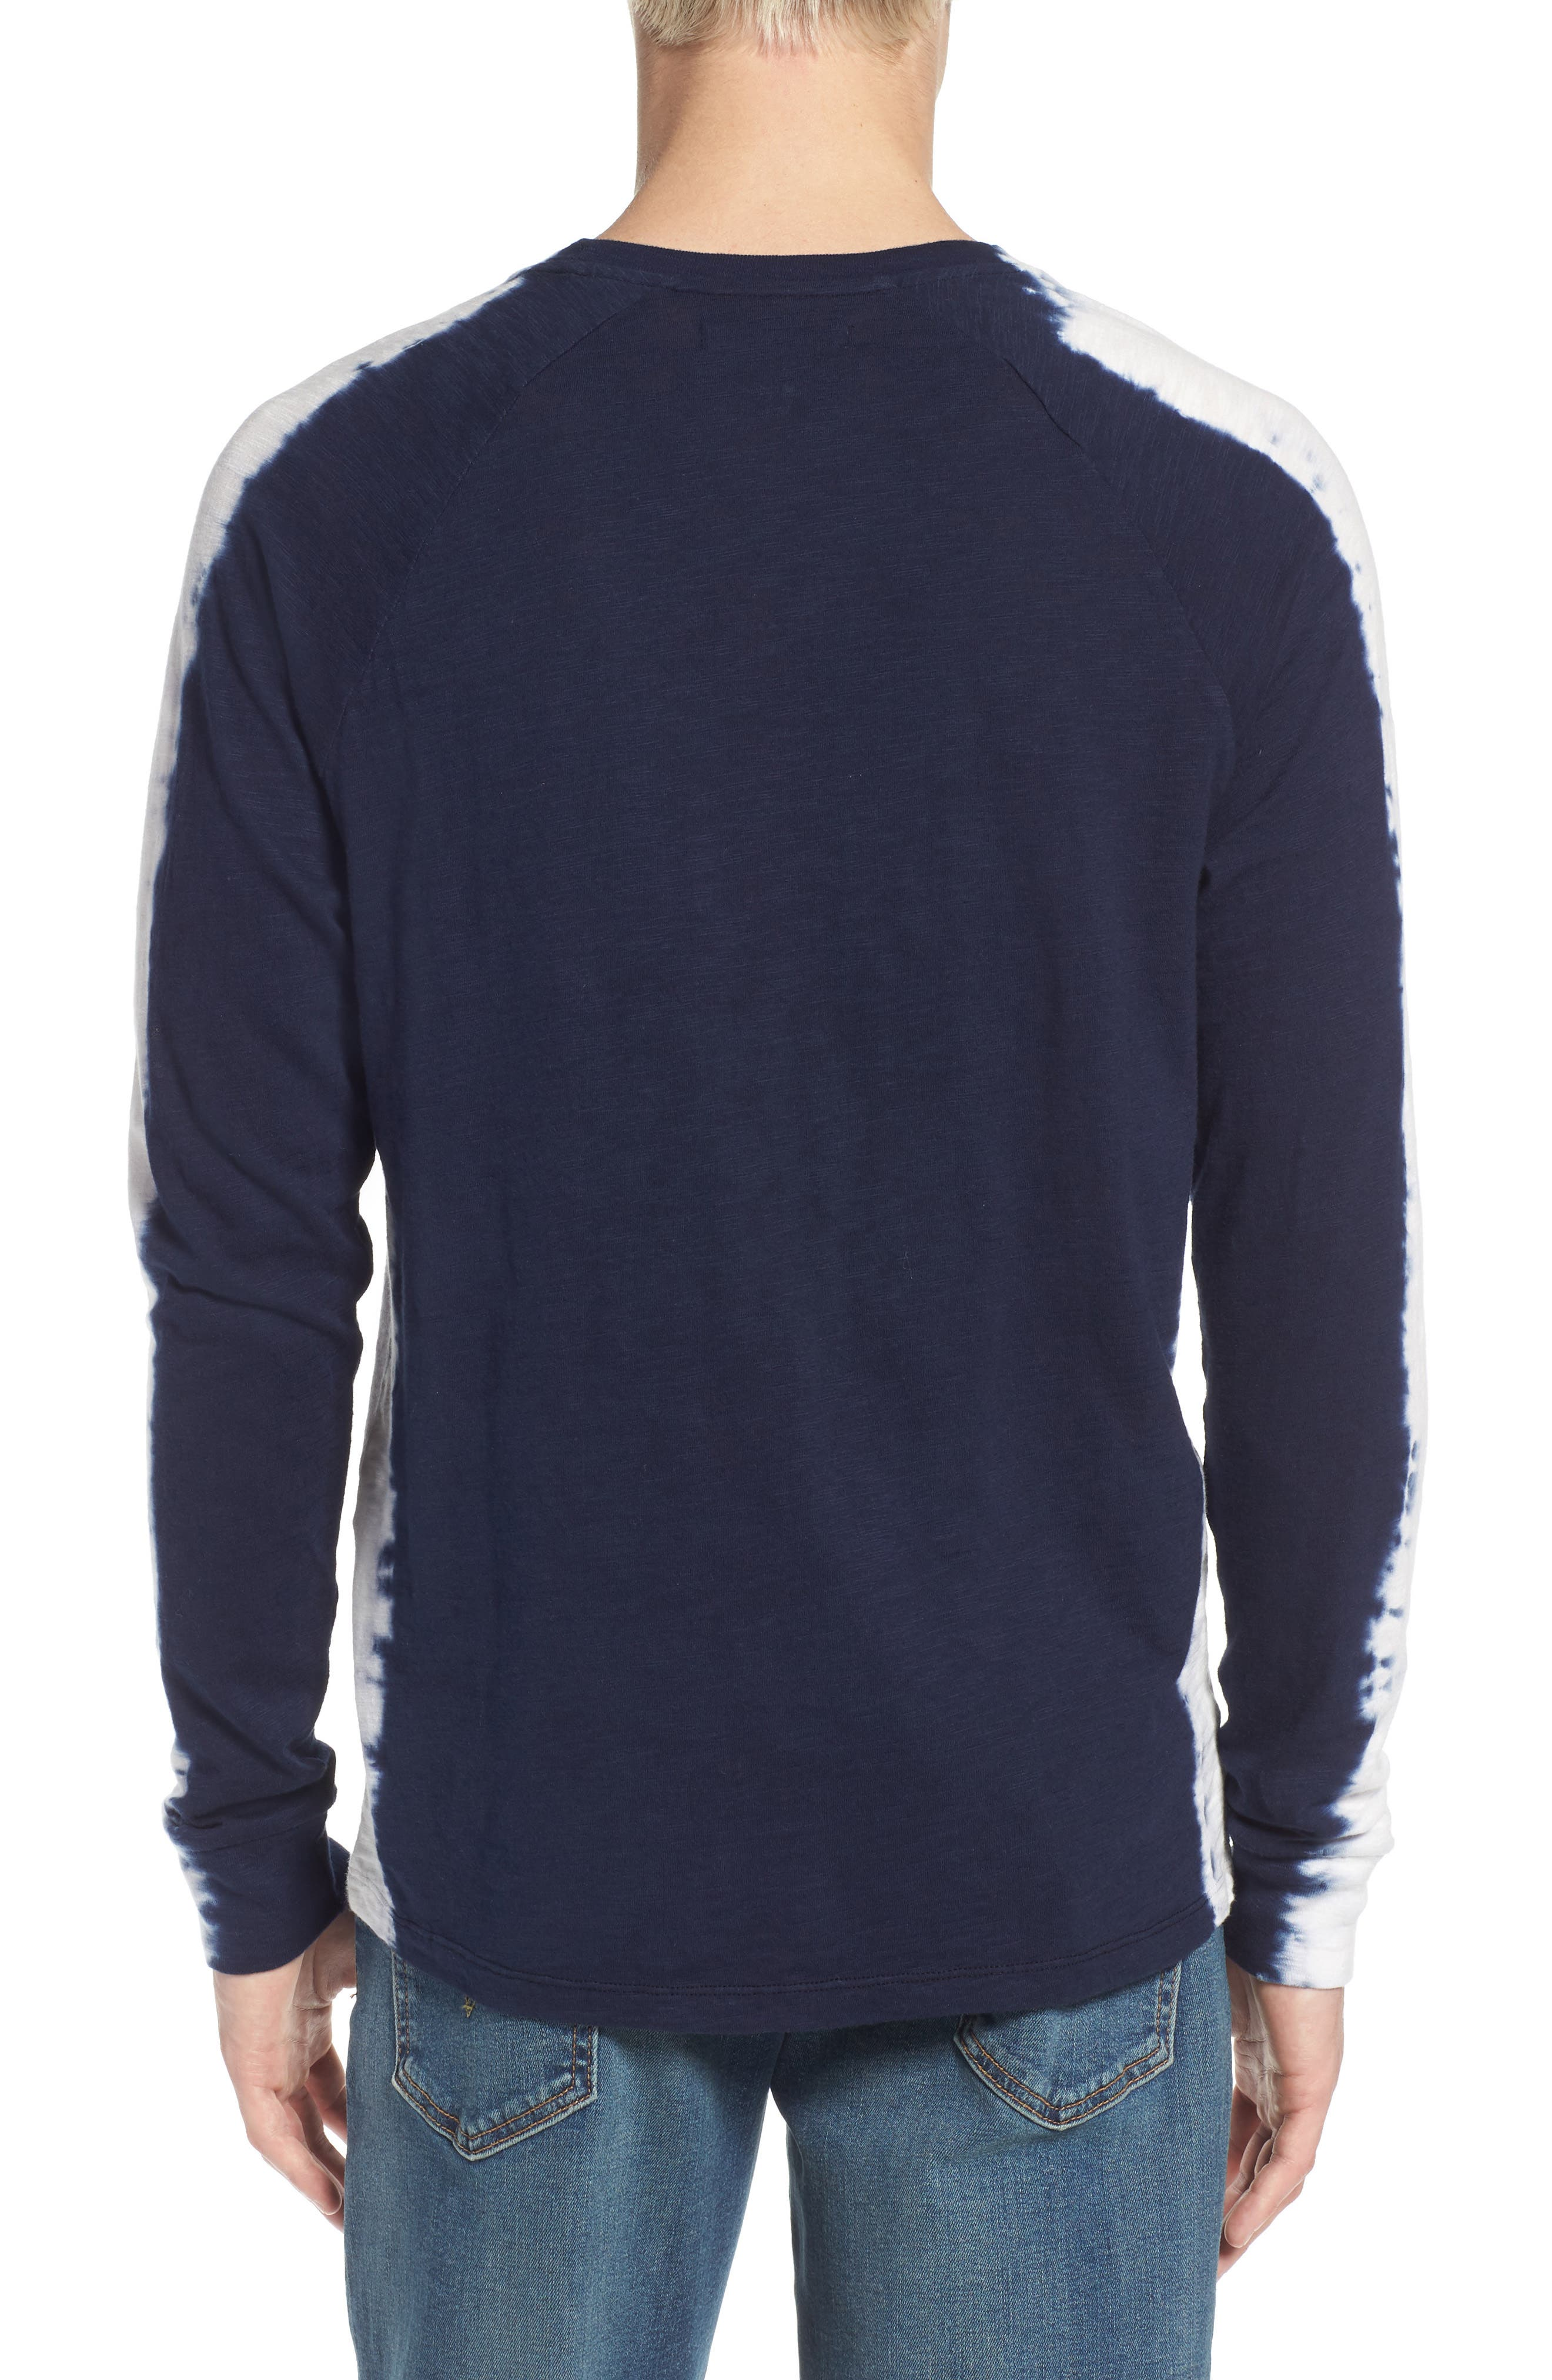 Raglan T-Shirt,                             Alternate thumbnail 2, color,                             Indigo Stripe Shibori Indigo